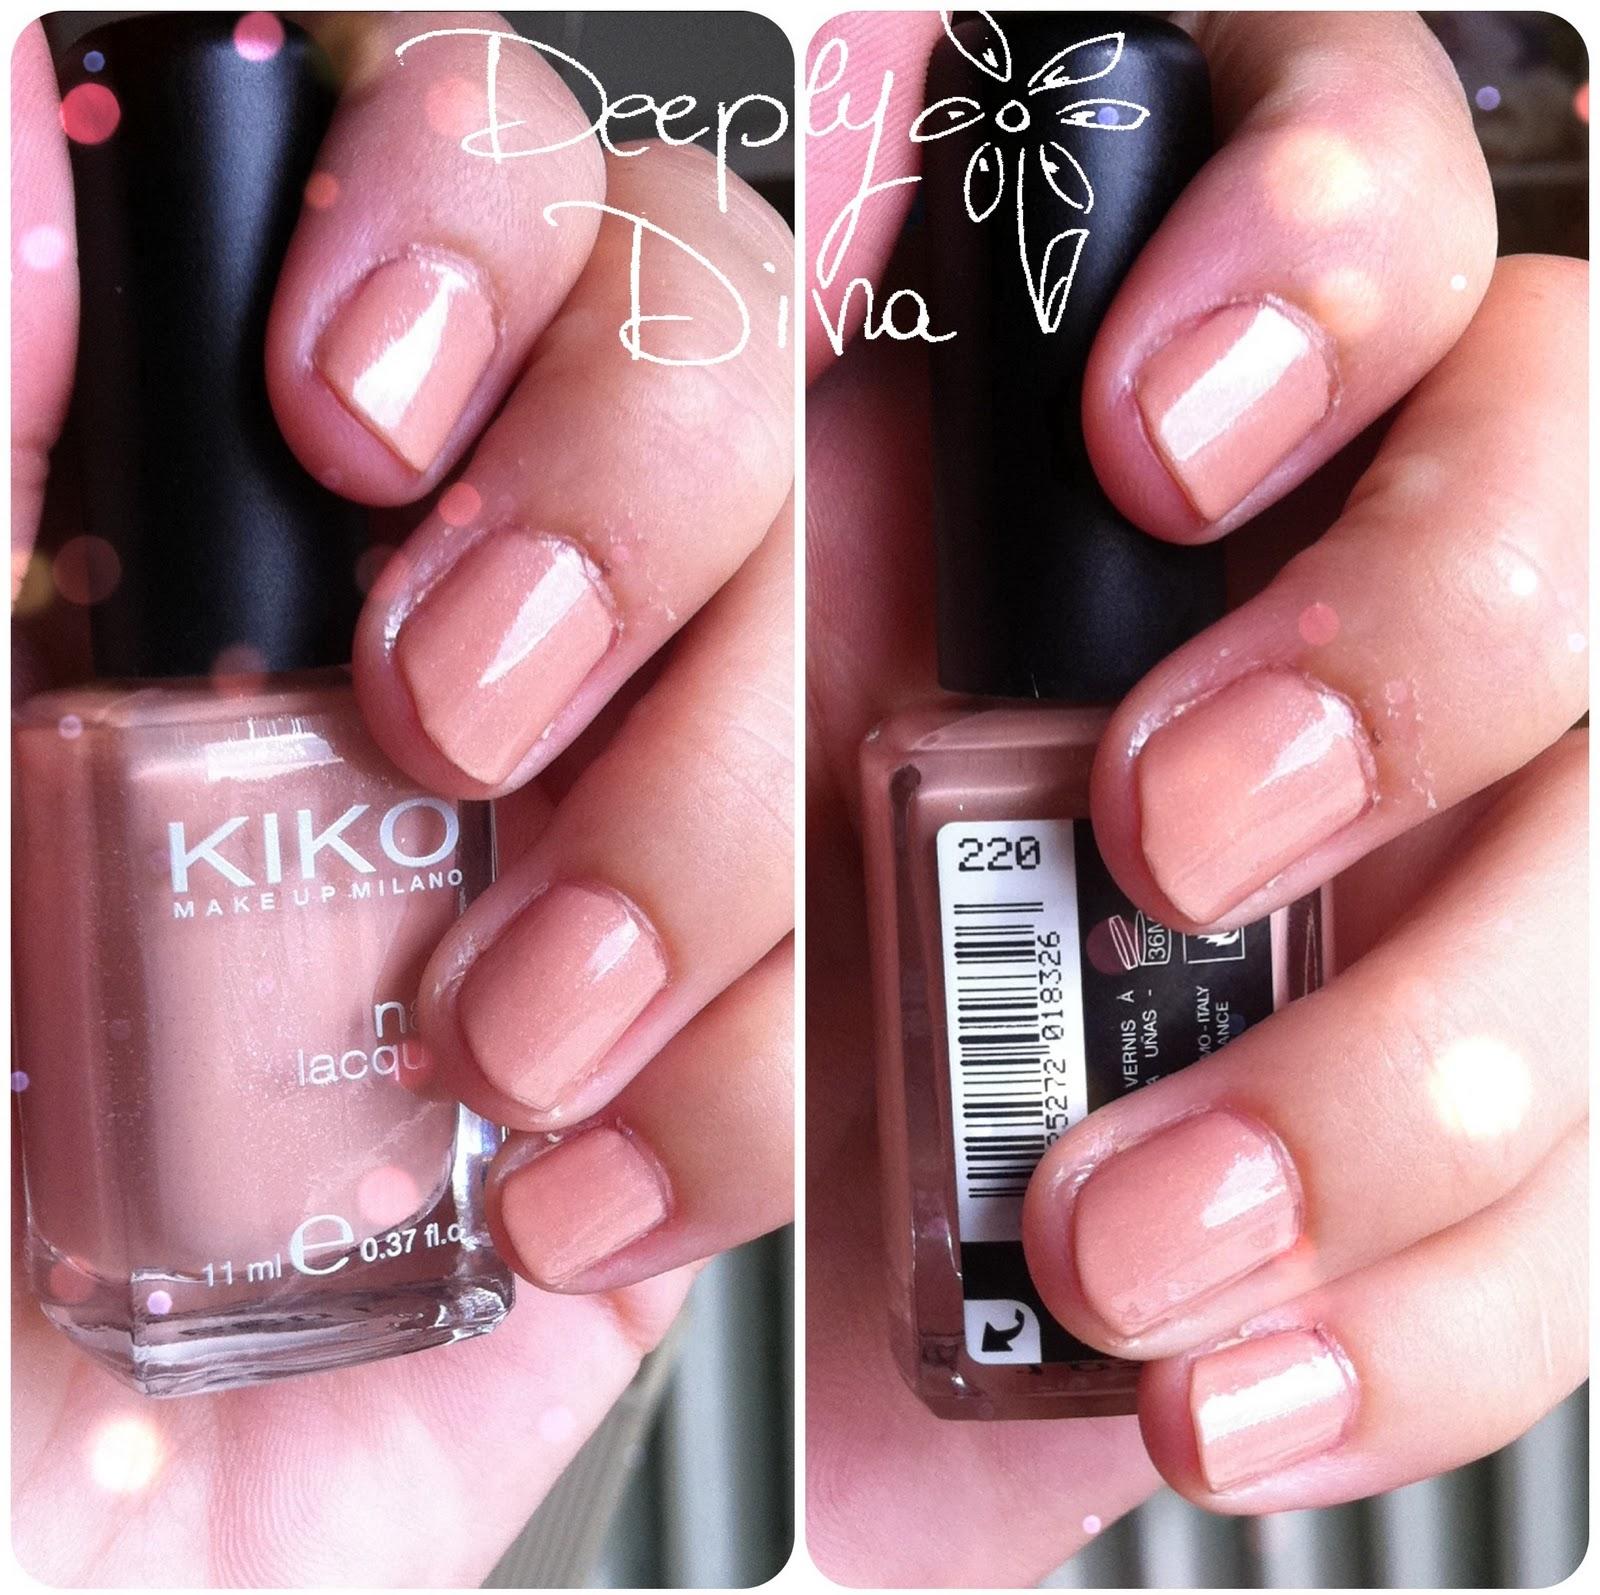 Deeply diva weekly nail art 5 - Diva nails prodotti ...